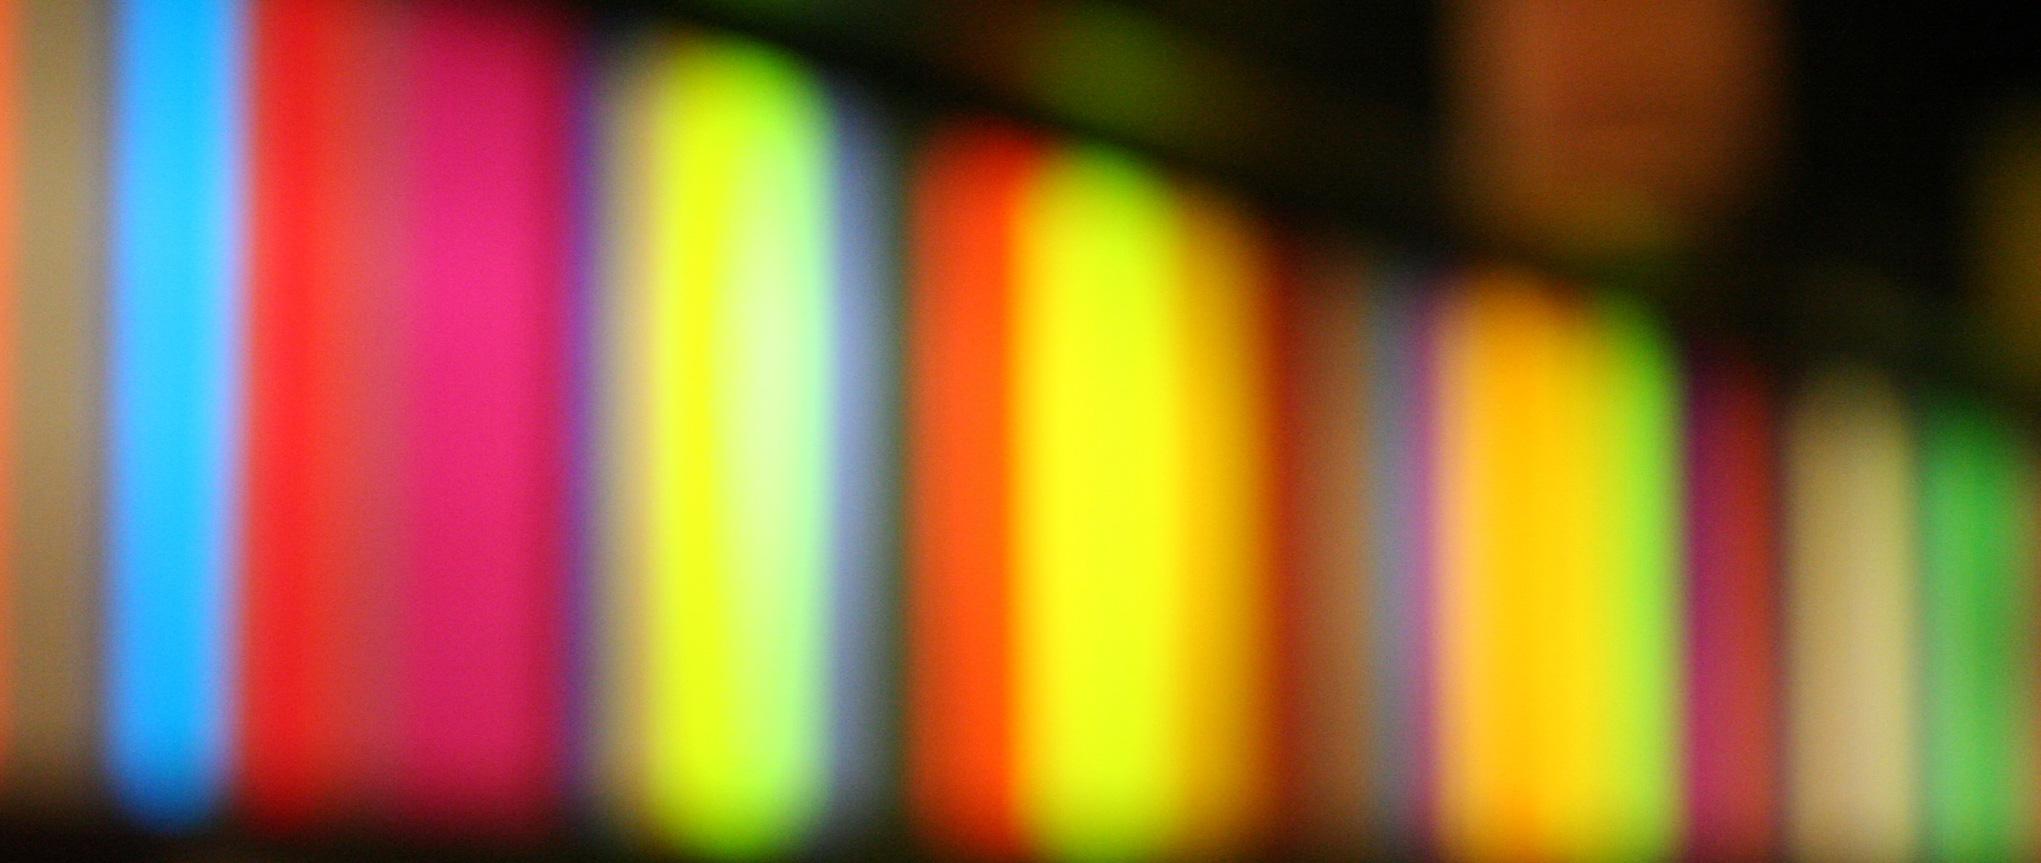 Blurred themes.jpg